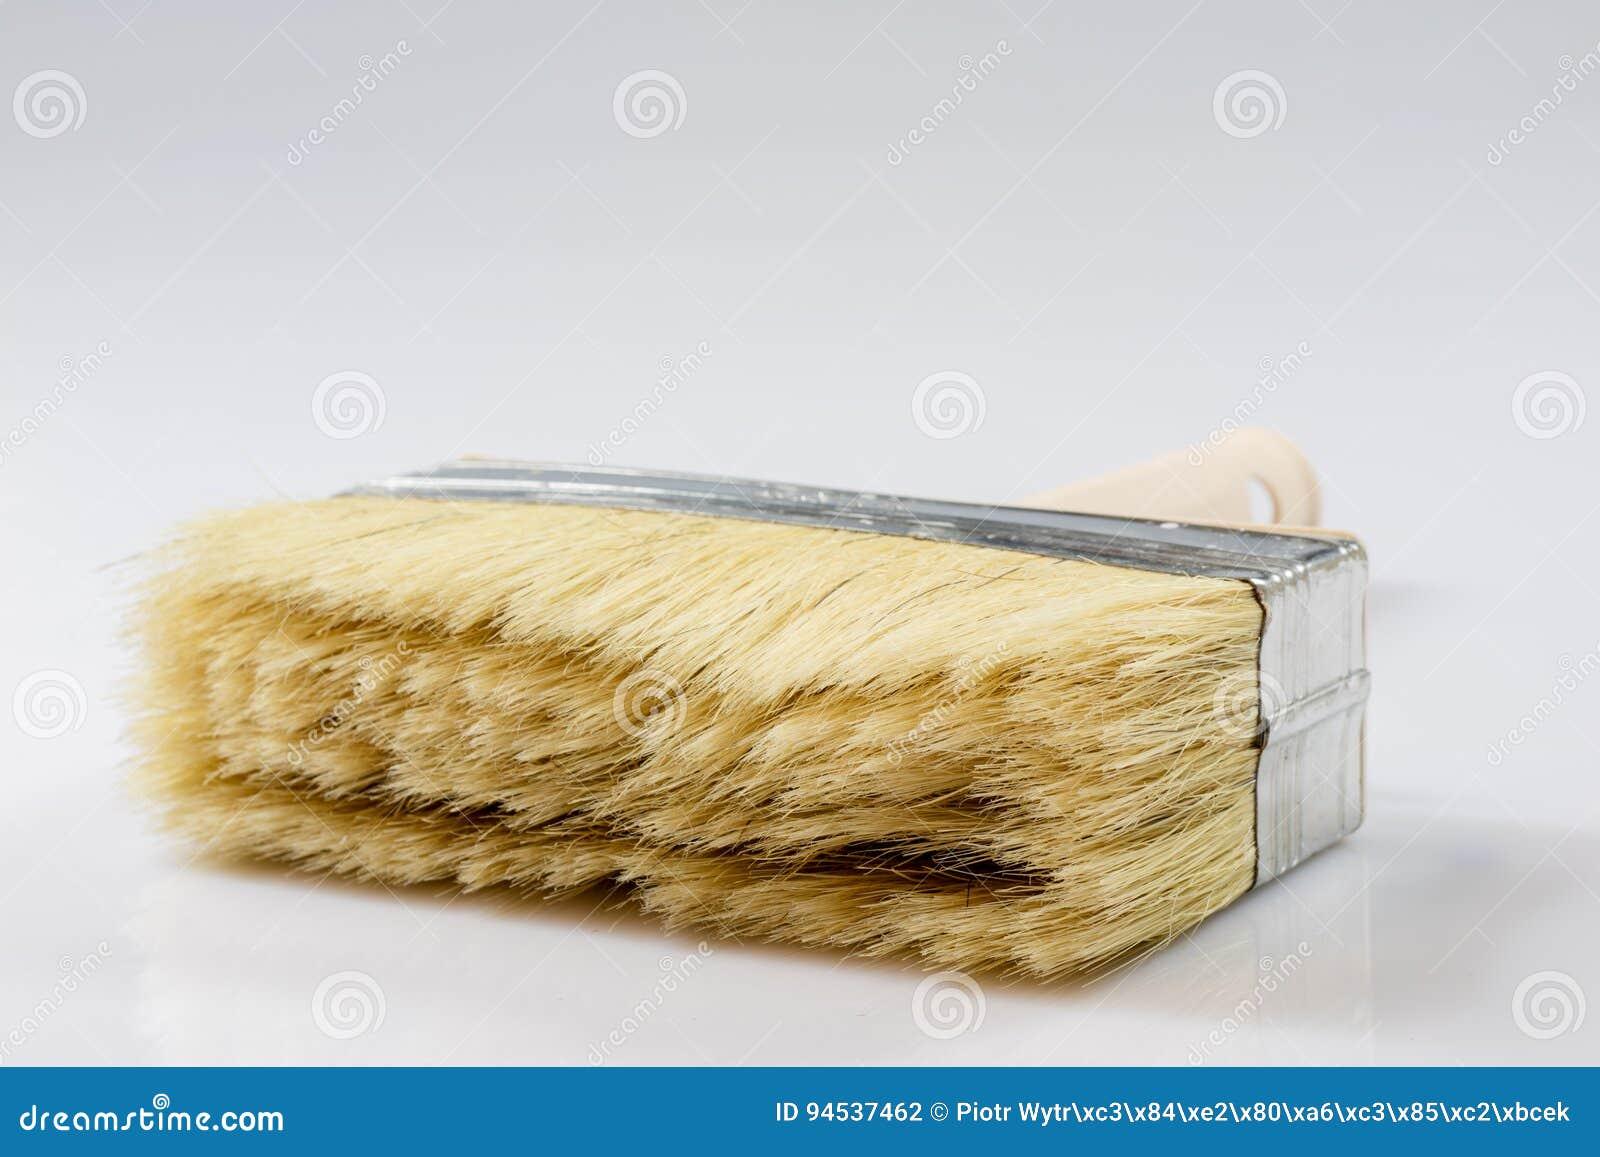 Large Paint Brush For Painting Walls, White Background Stock Photo ...